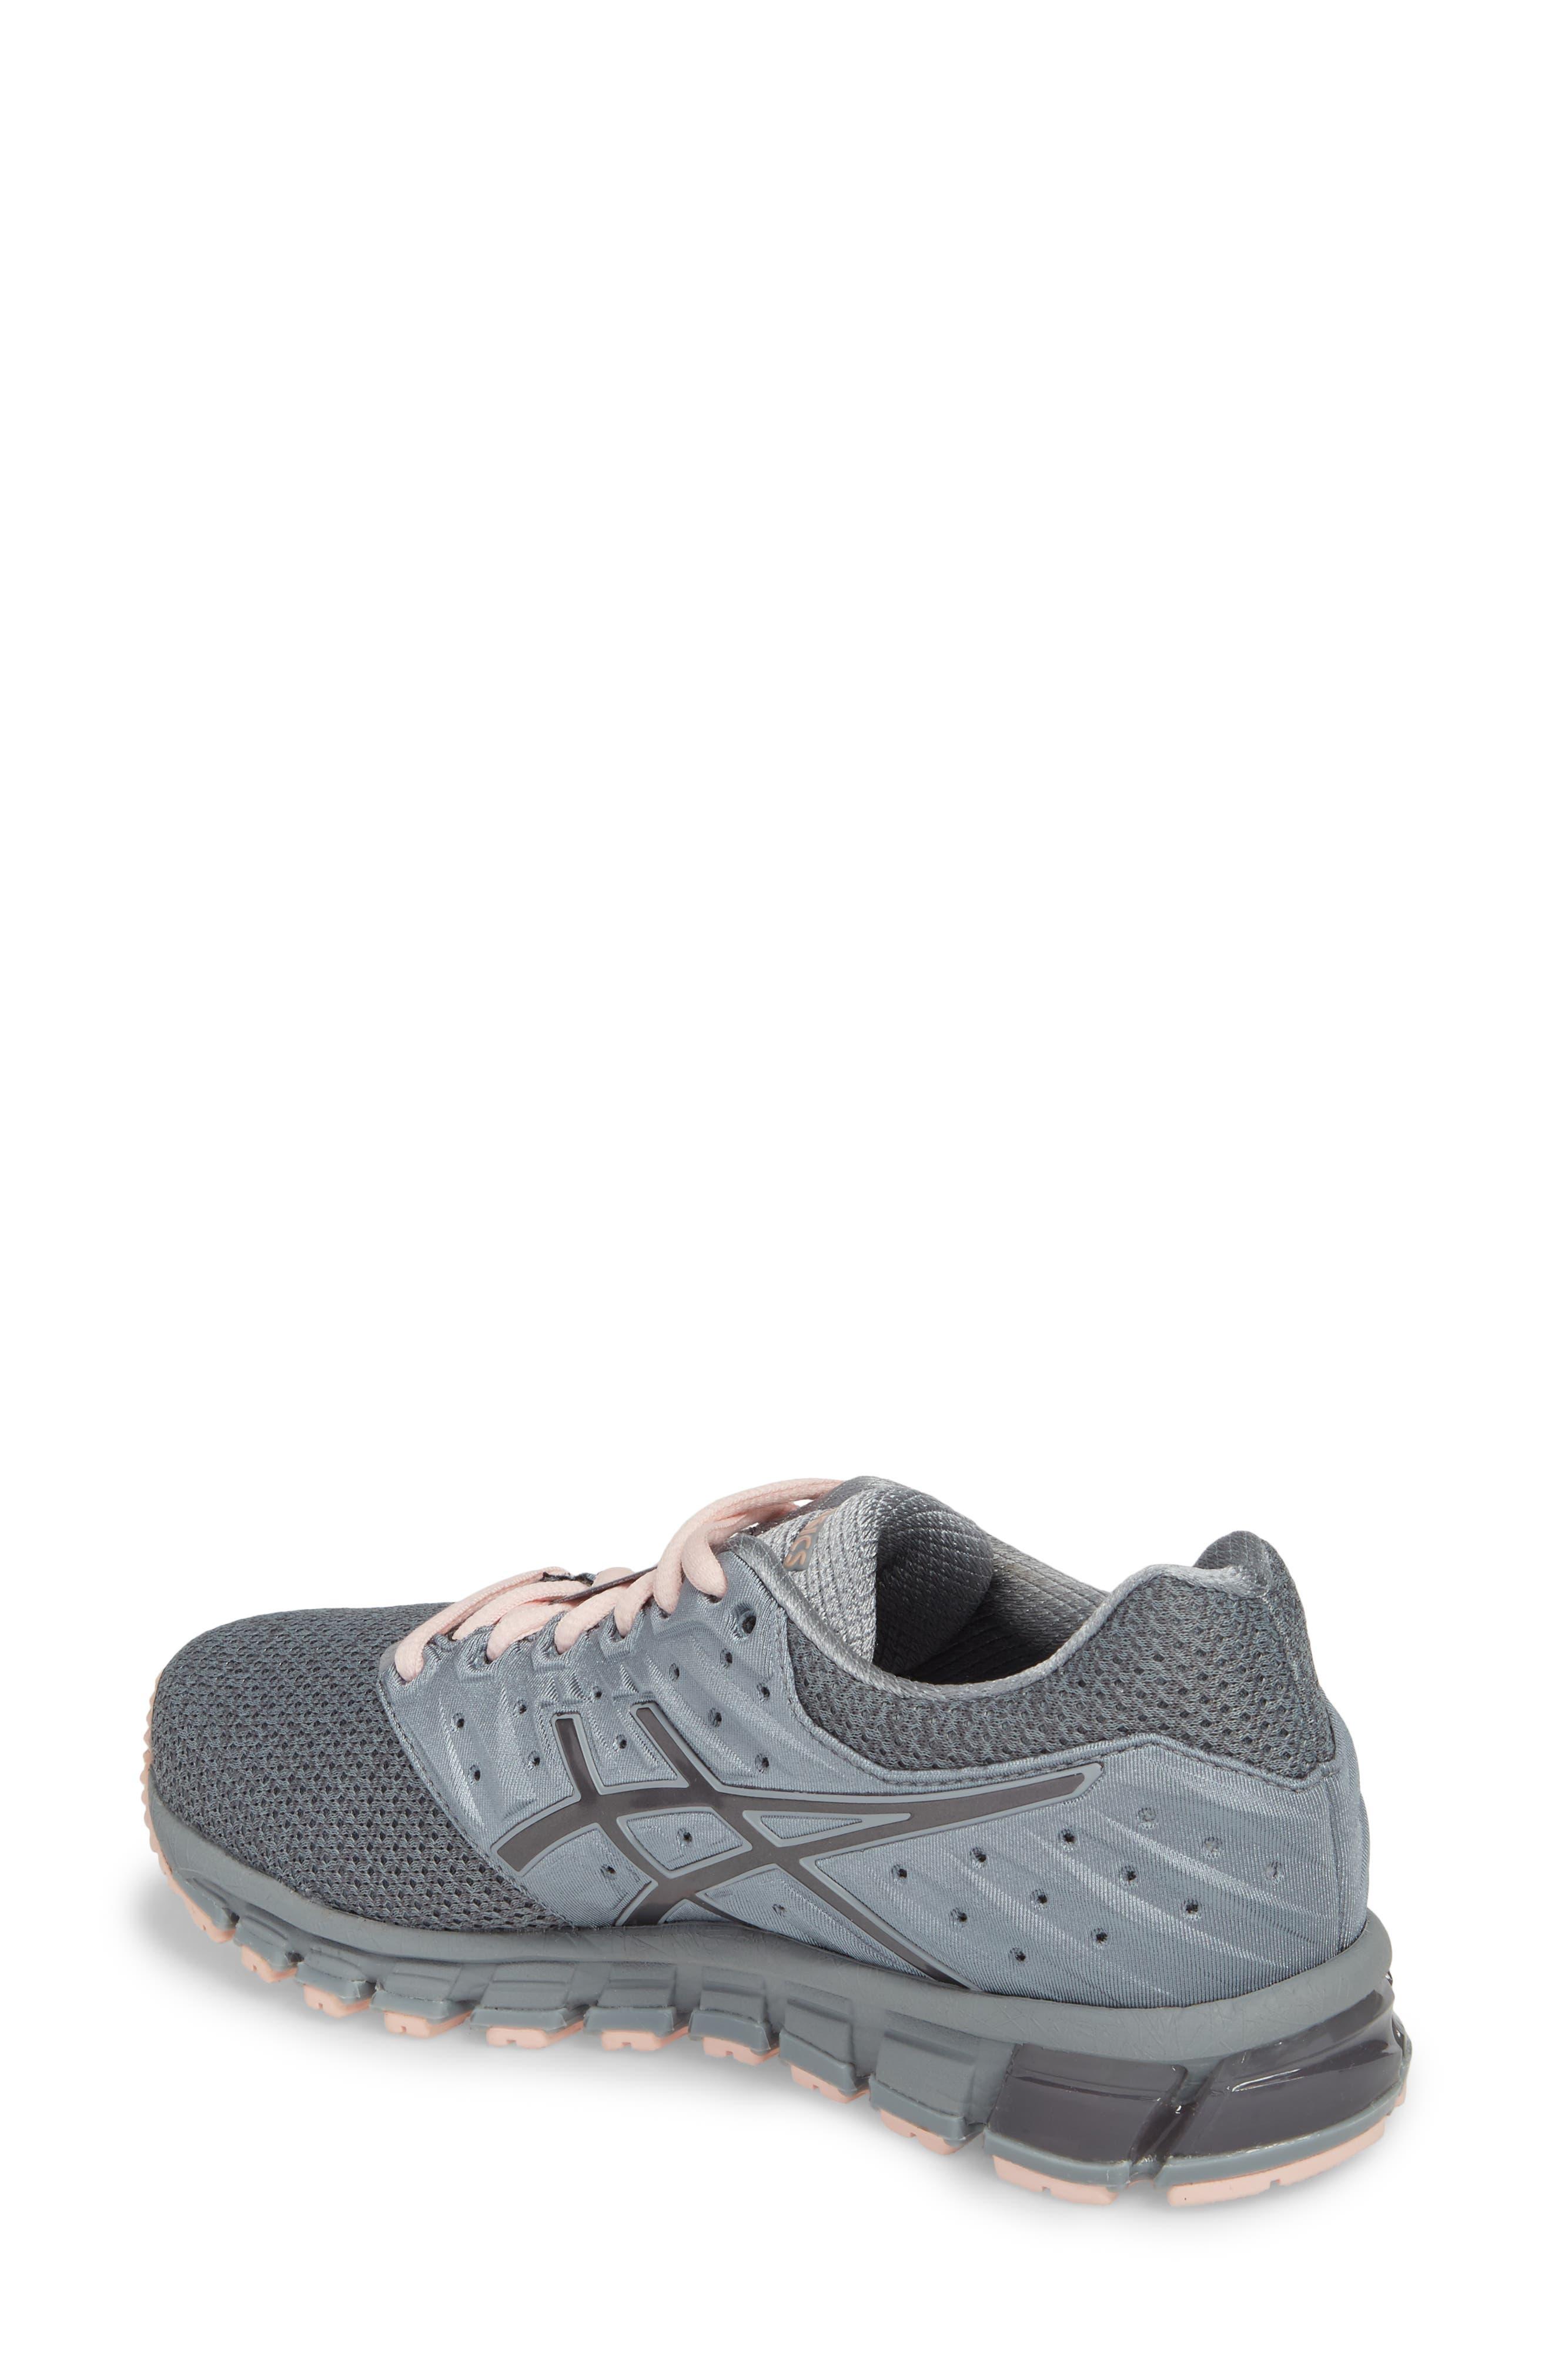 'GEL-Quantum 180 2' Running Shoe,                             Alternate thumbnail 9, color,